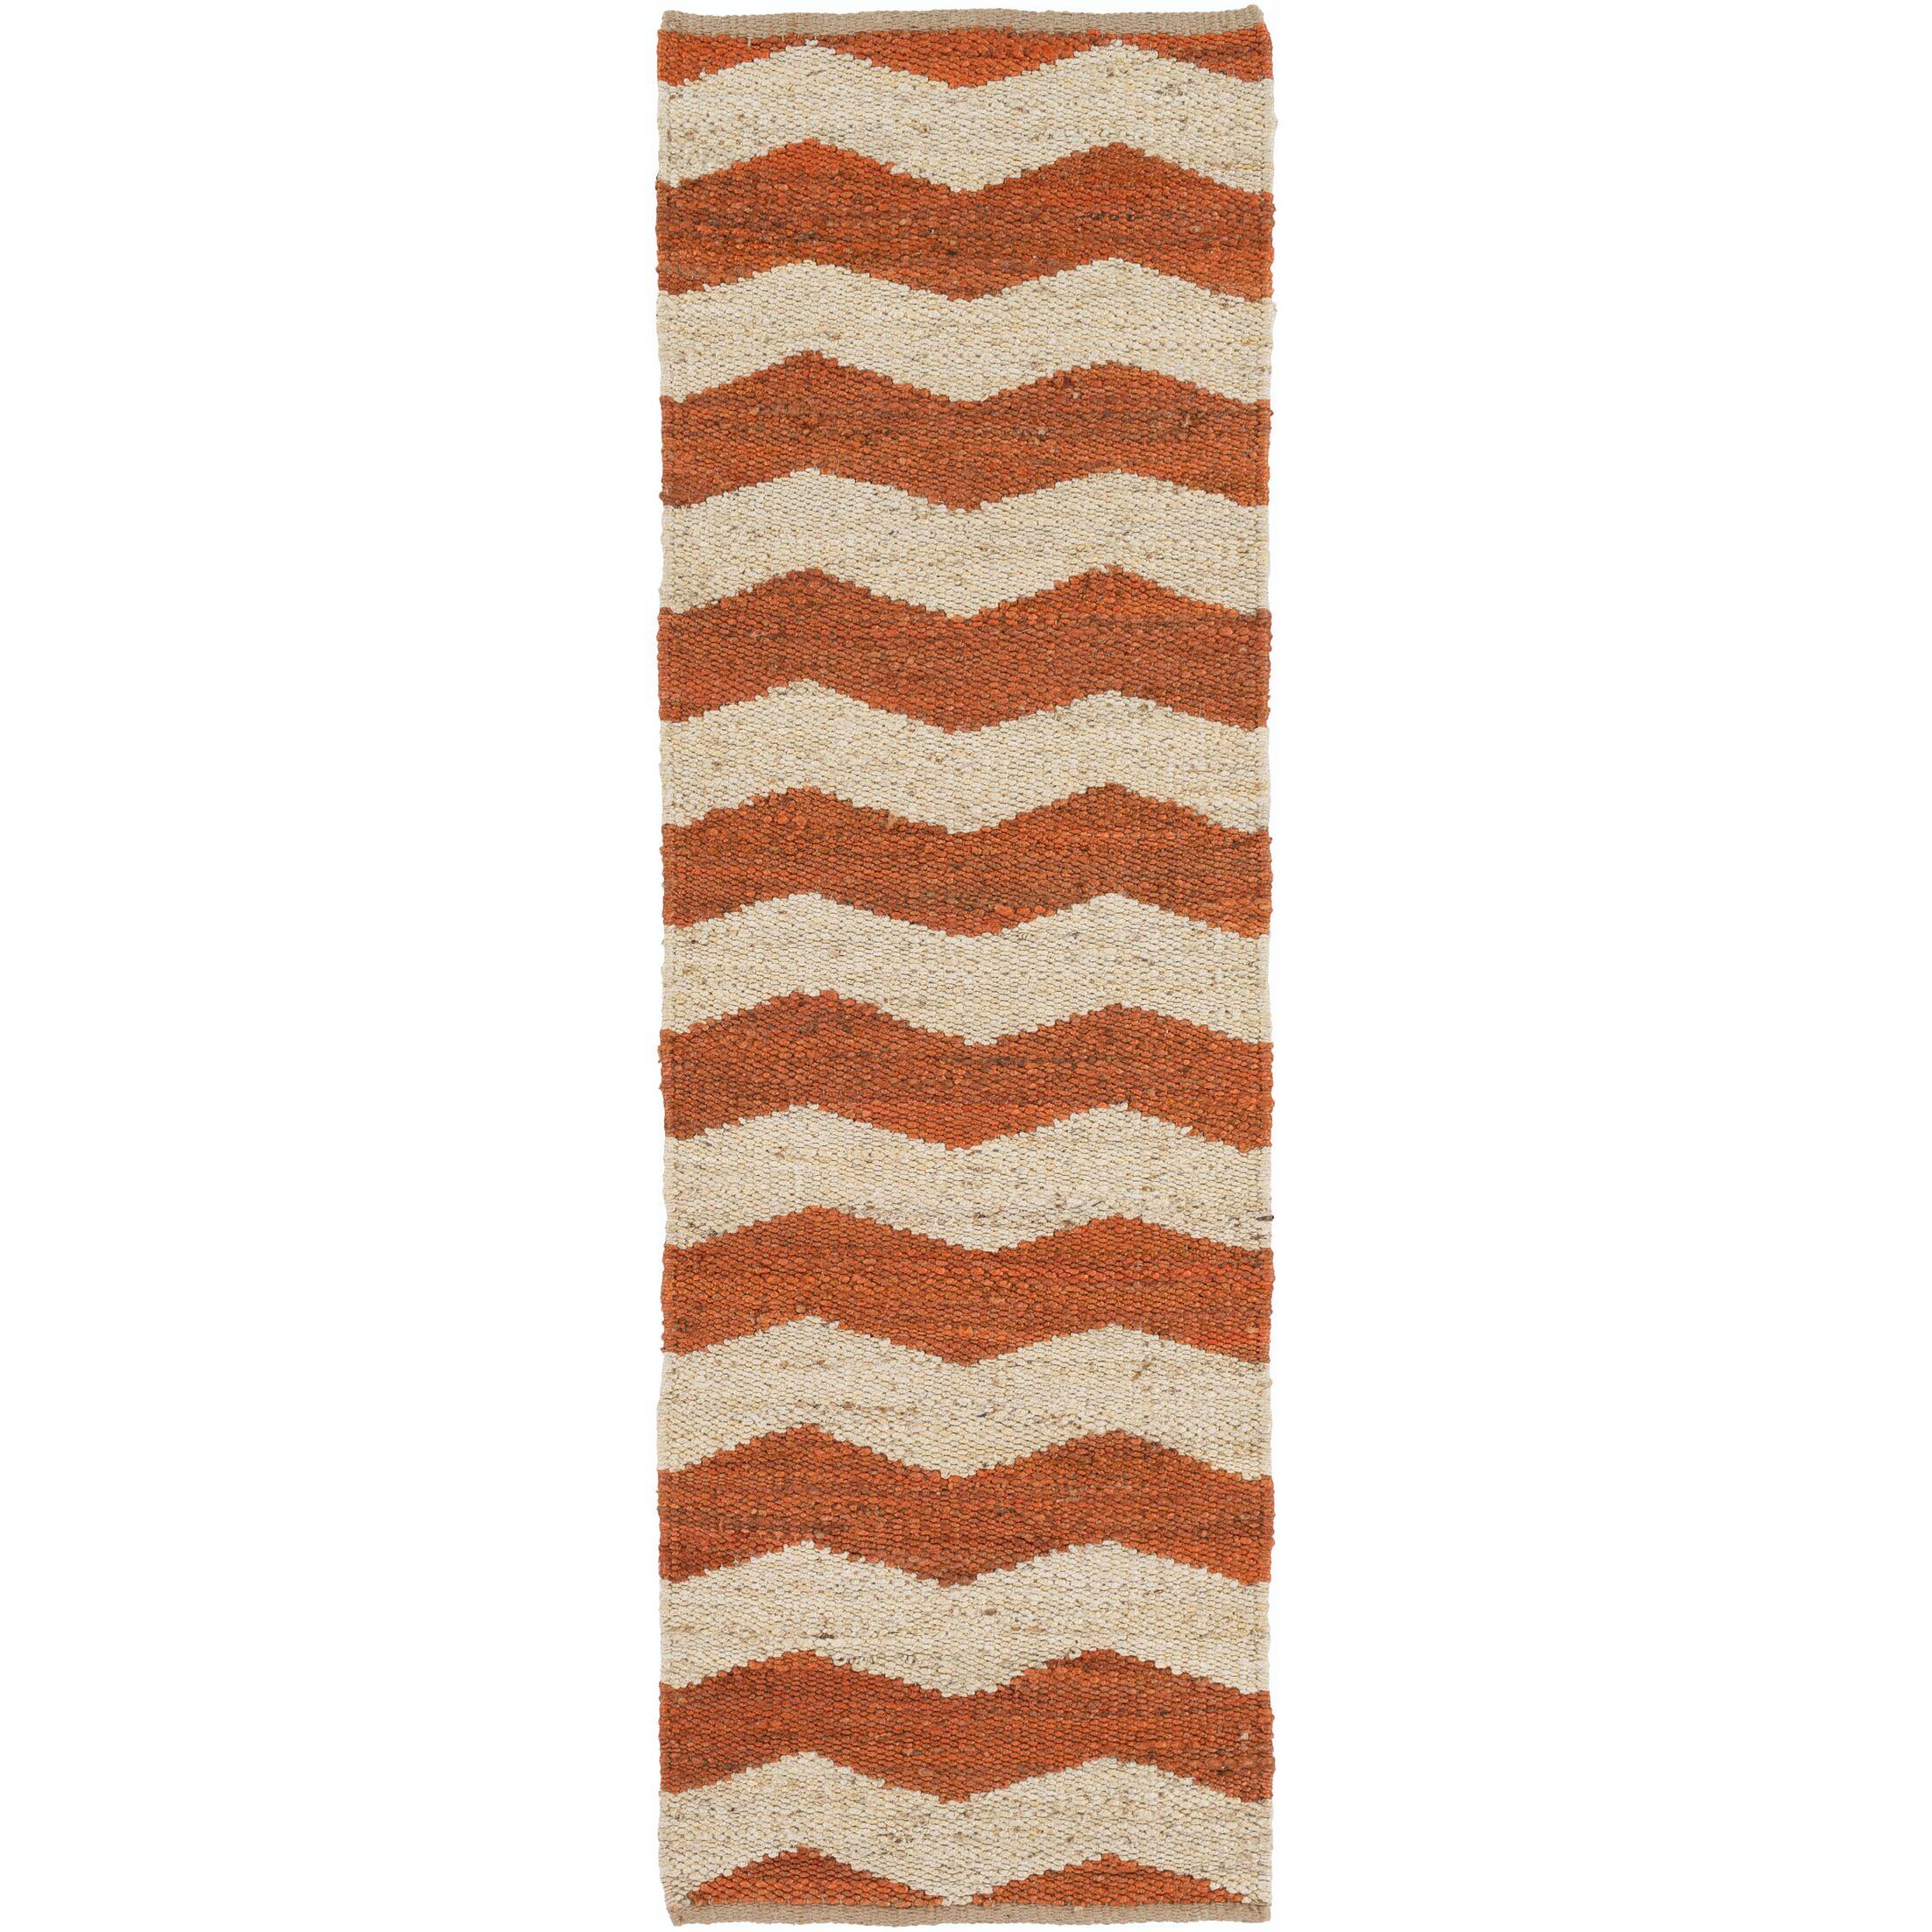 Woodcroft Hand-Woven Burnt Orange/Cream Area Rug Rug Size: Runner 2'6